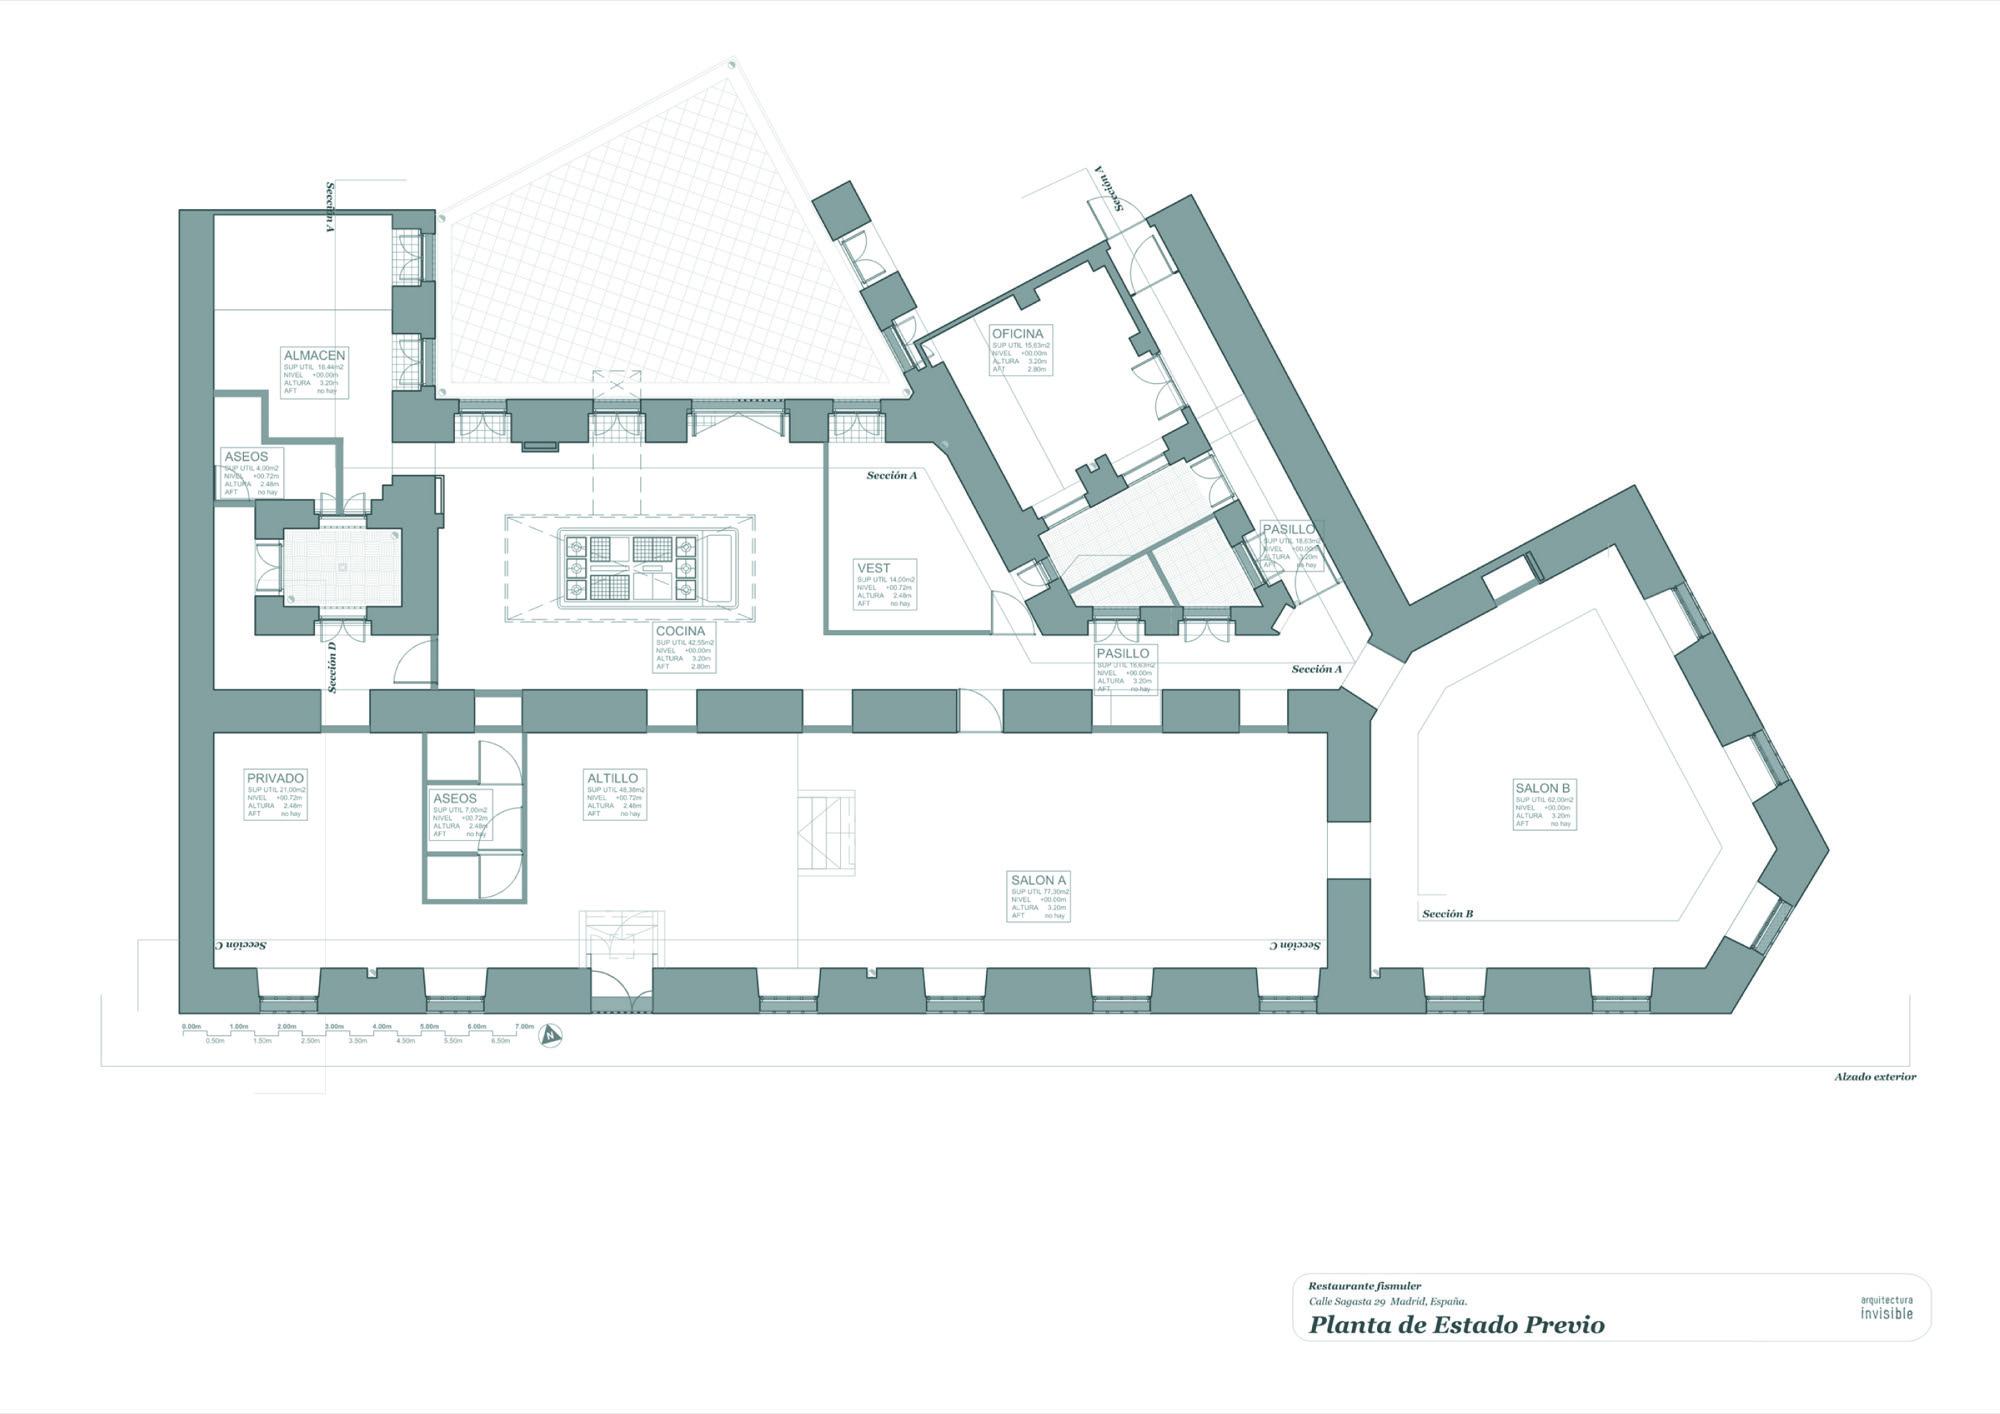 Galer a de fismuler arquitectura invisible 25 - Arquitectura invisible ...